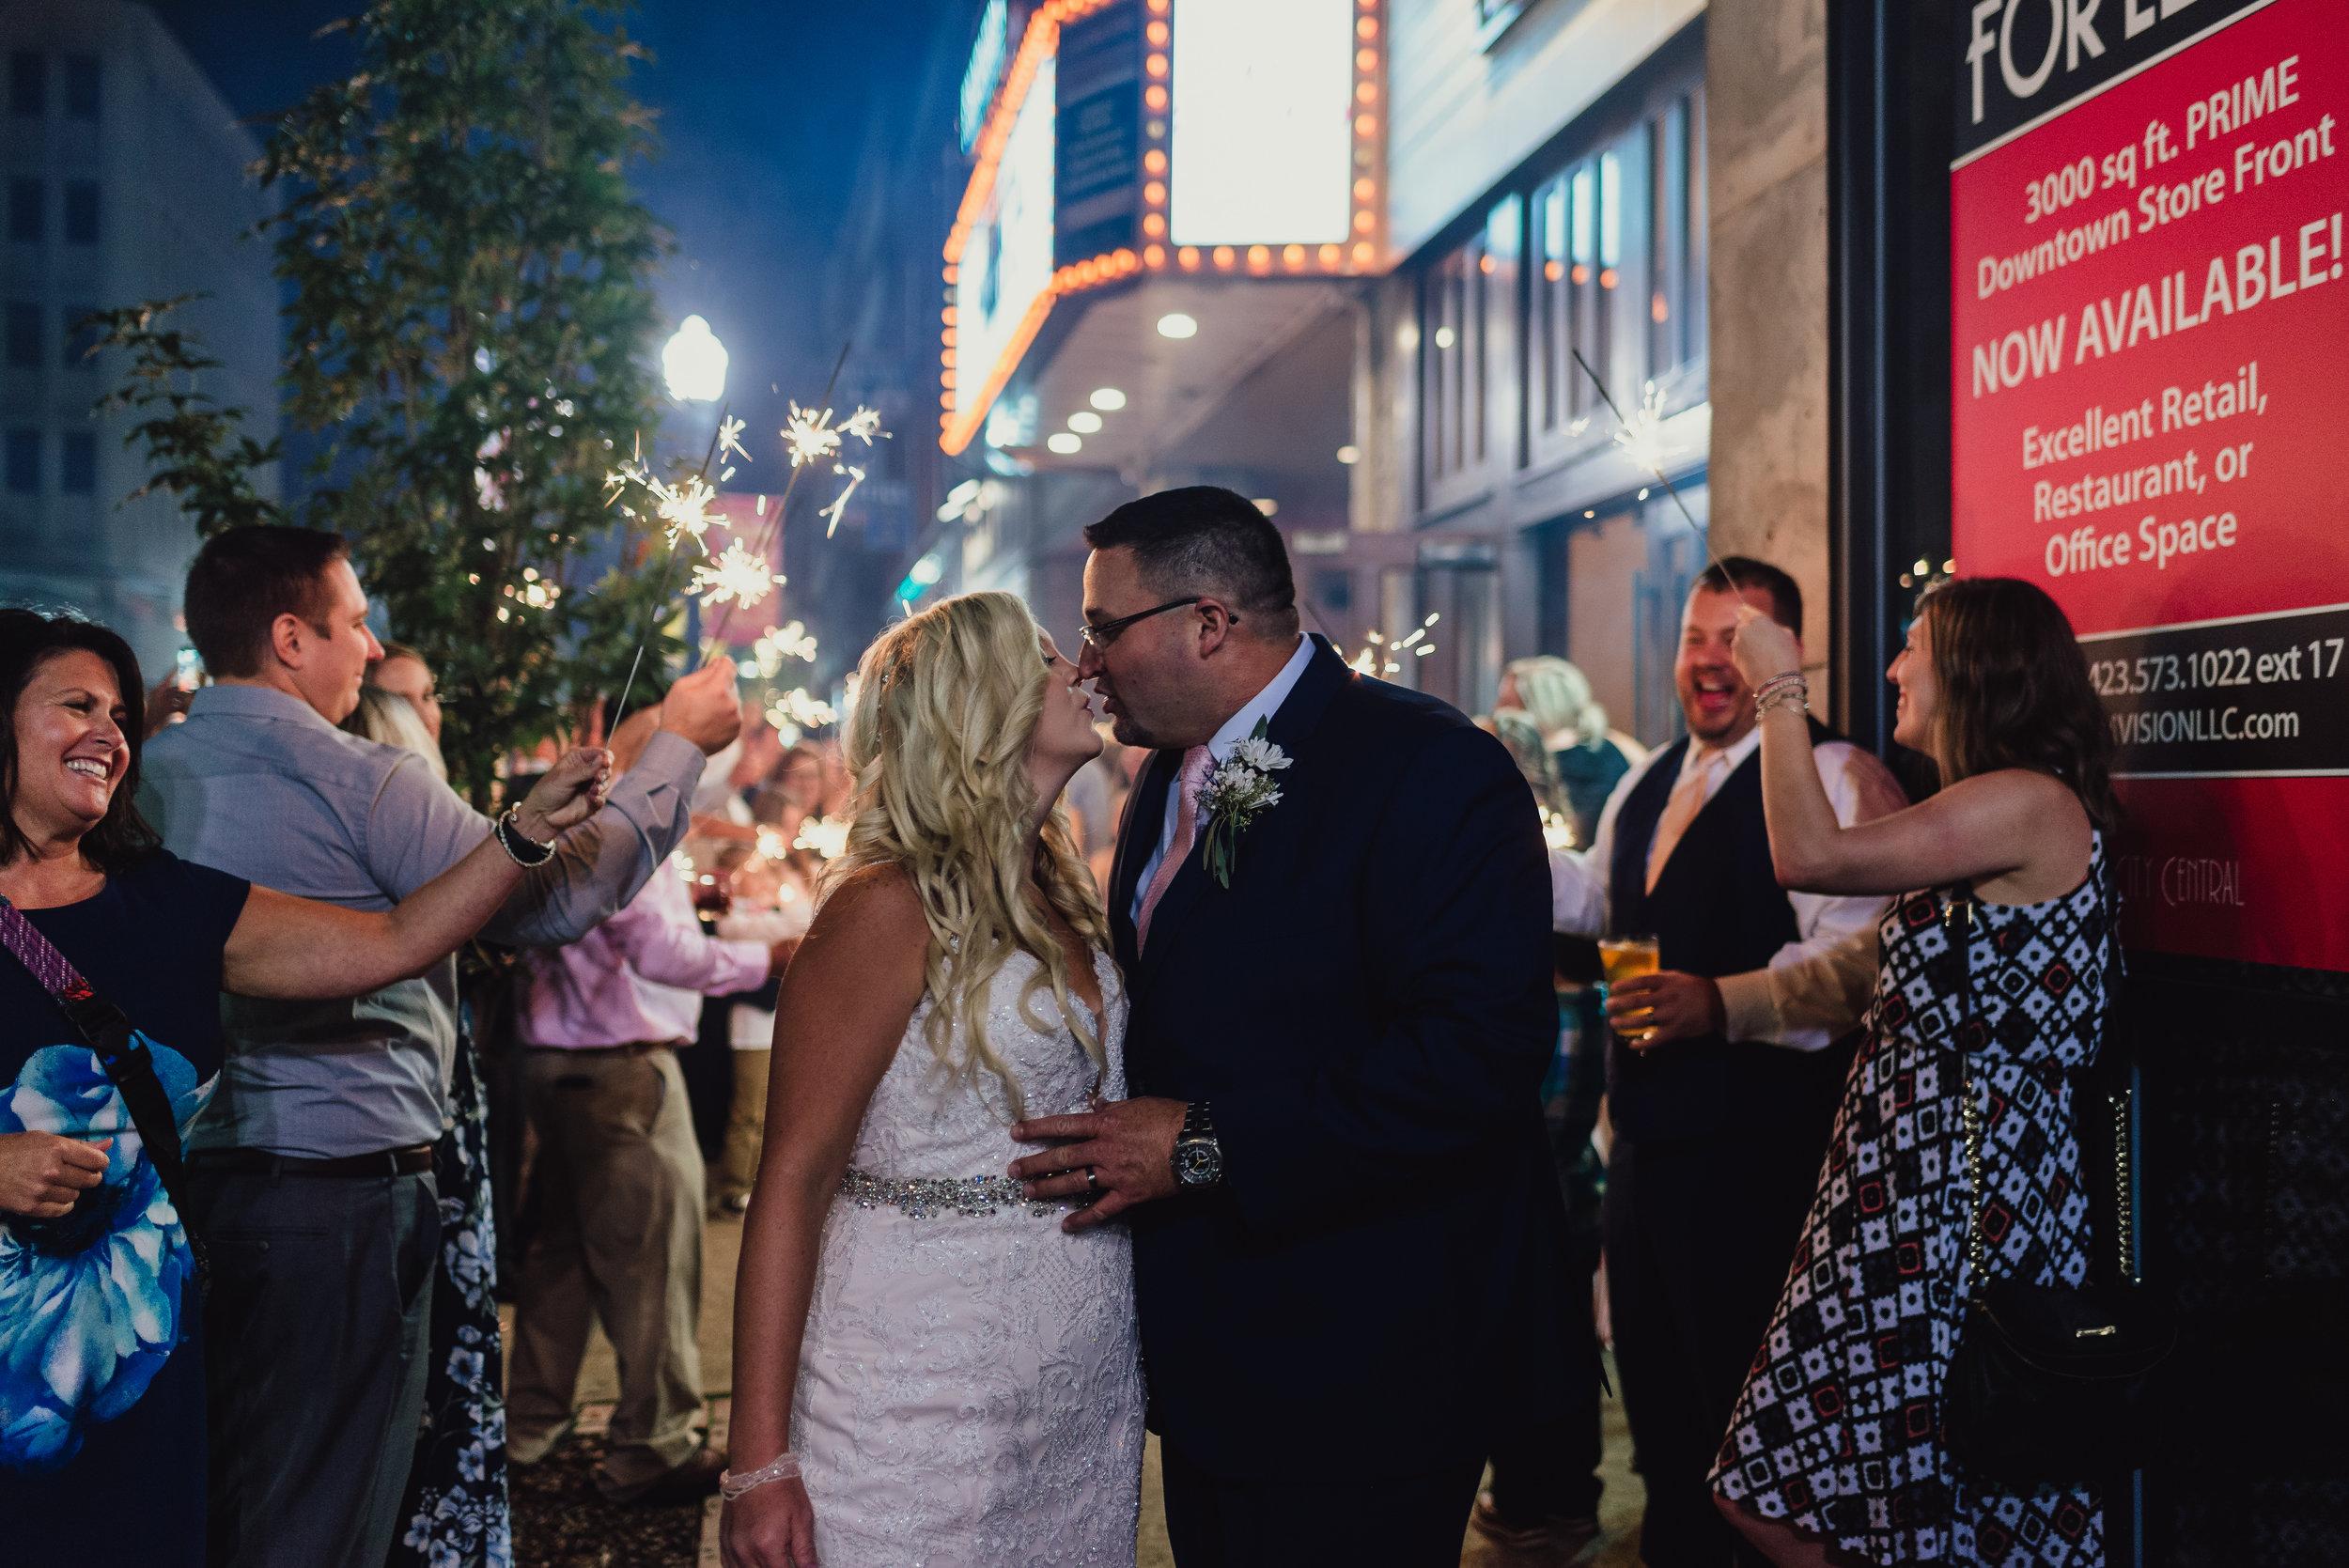 east-tn-wedding-photographer-tennessee-elopement-photographer-kingsport-tn-wedding-photographer (846 of 1001).jpg